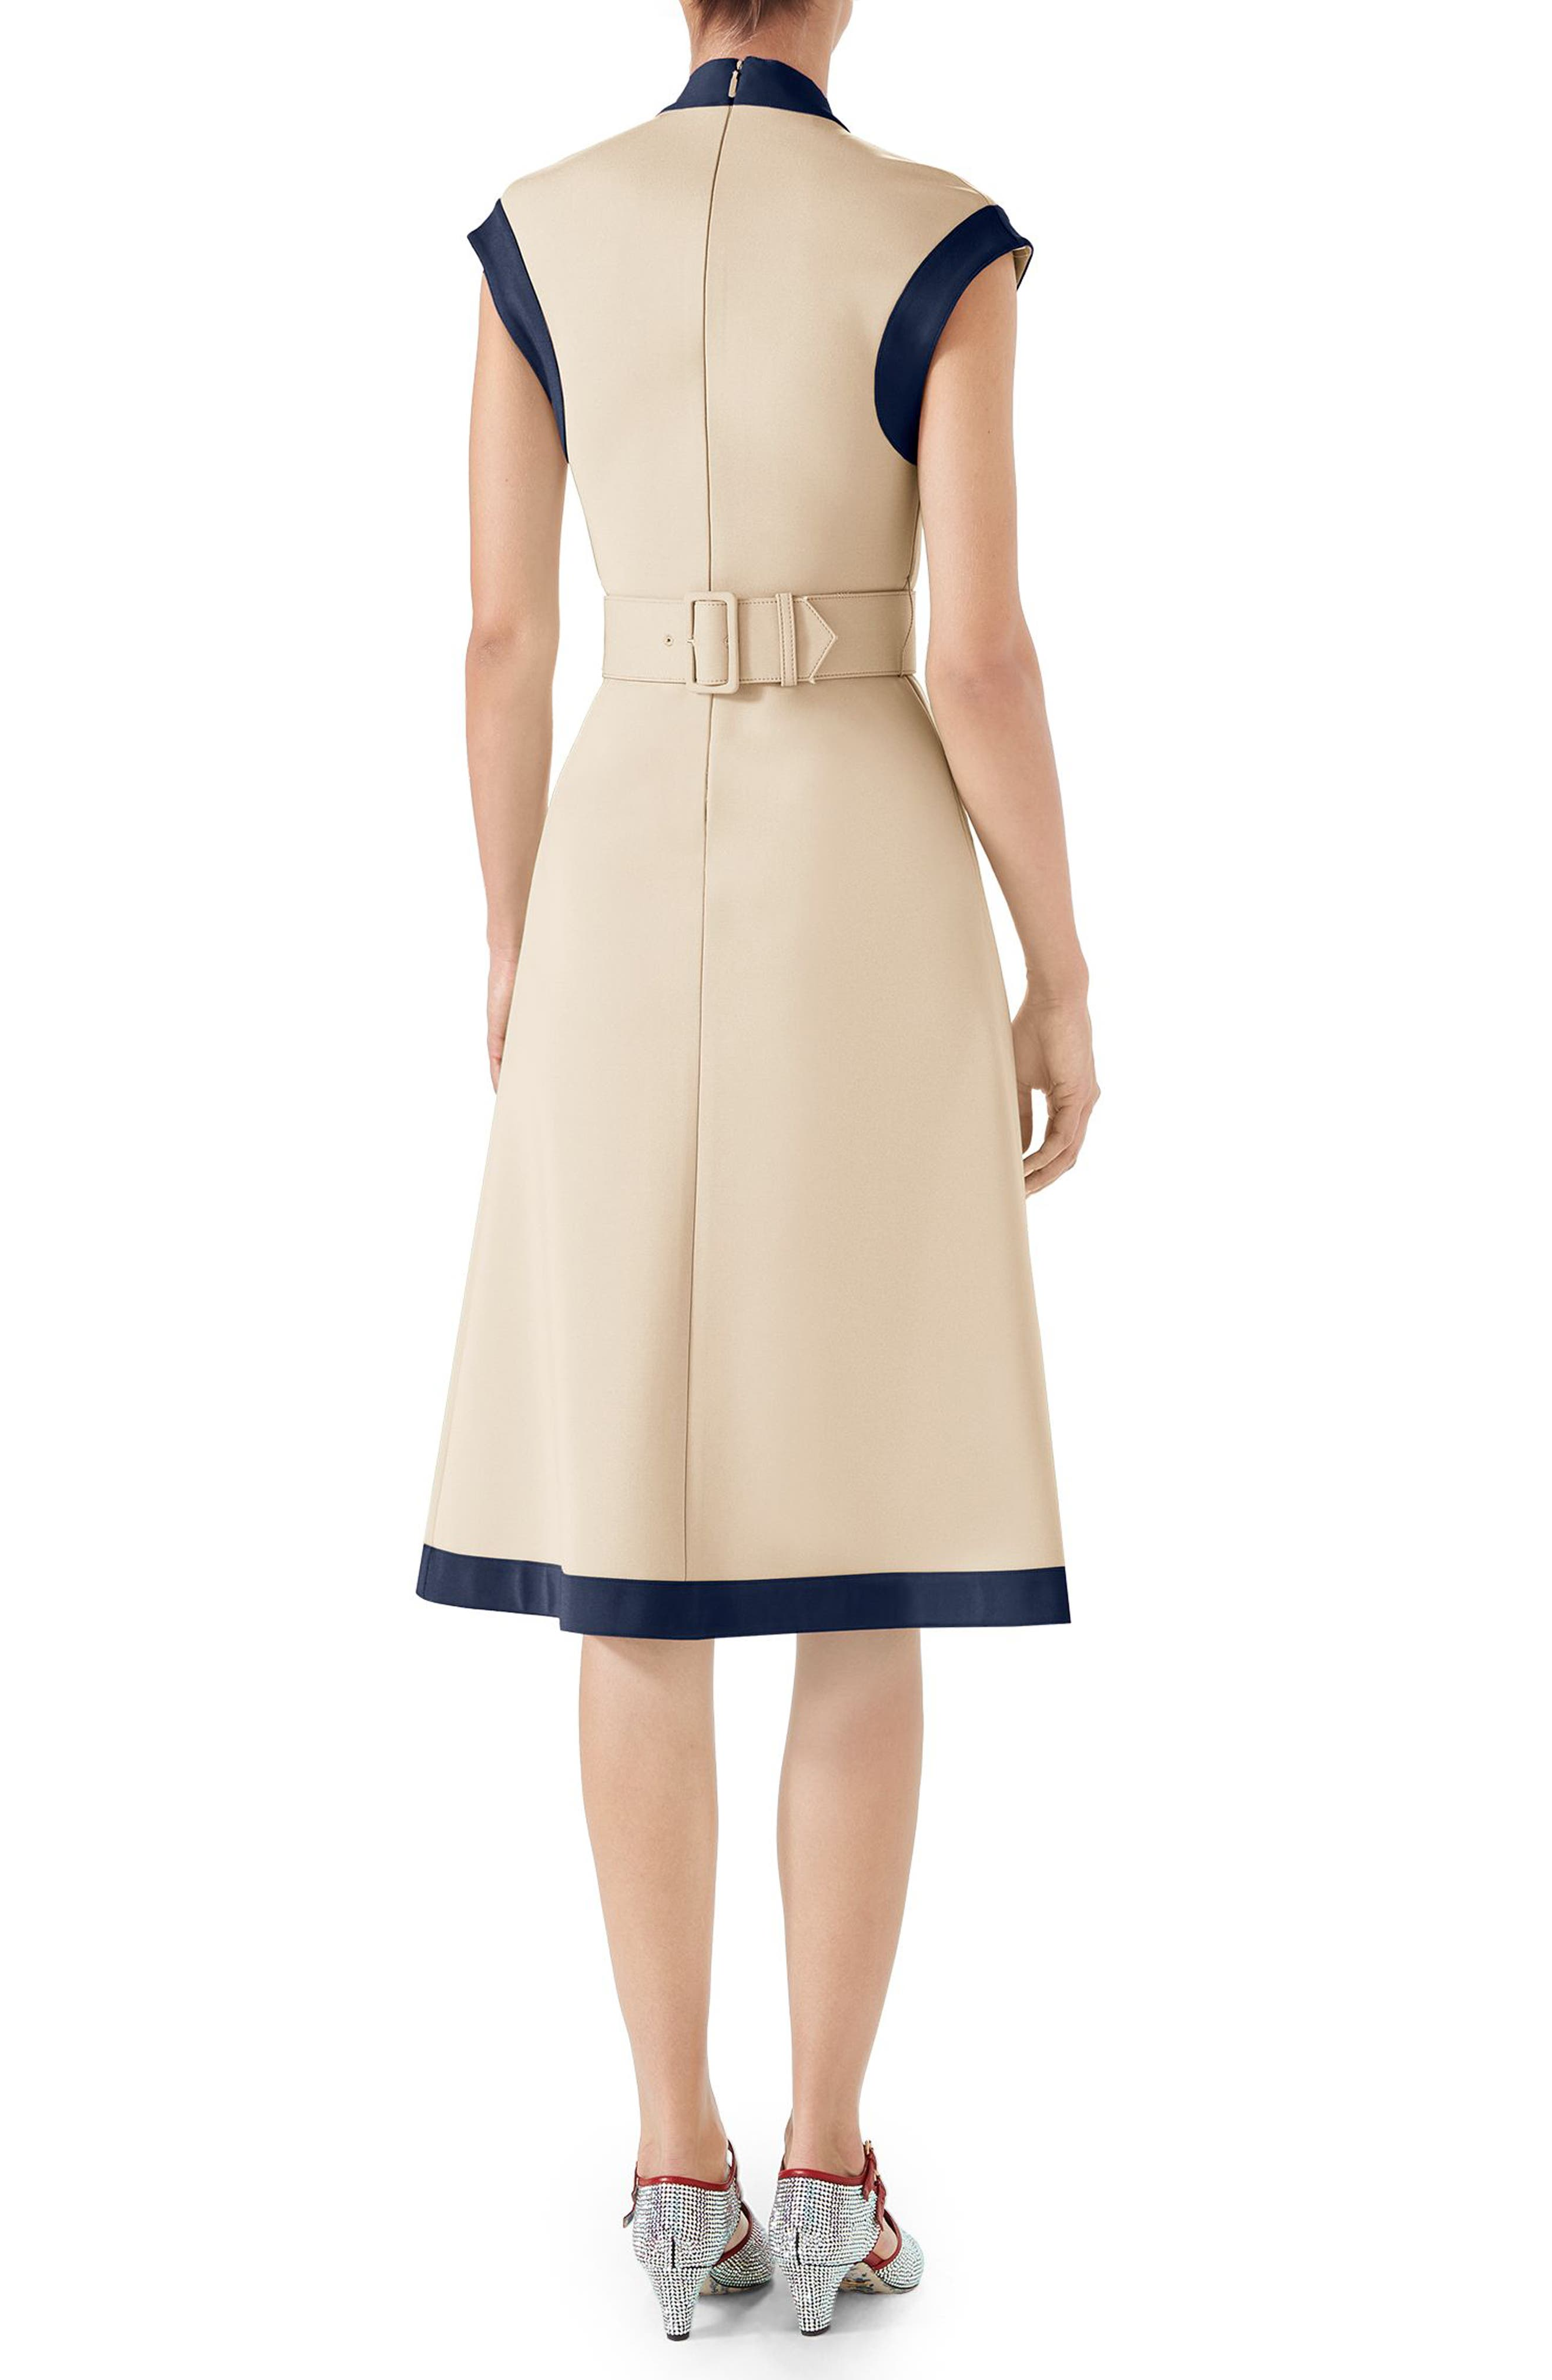 Contrast Trim Belted Dress,                             Alternate thumbnail 2, color,                             Almond Flower/ Royal